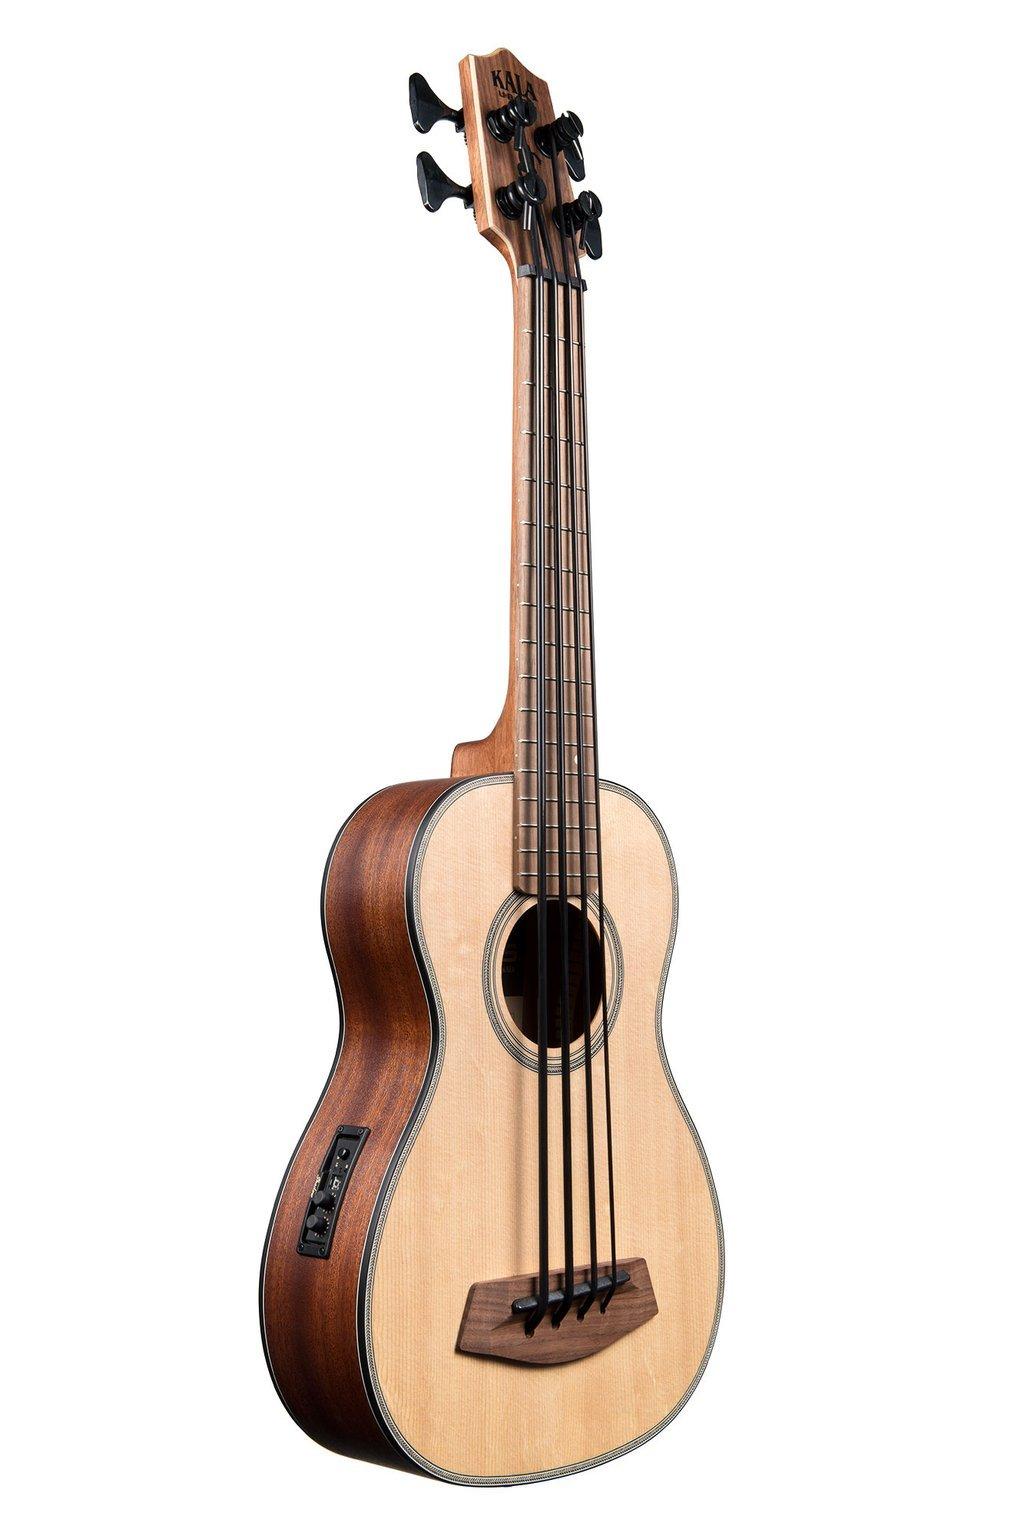 Kala U-Bass Solid Spruce Top Mahogany Back w/Bag